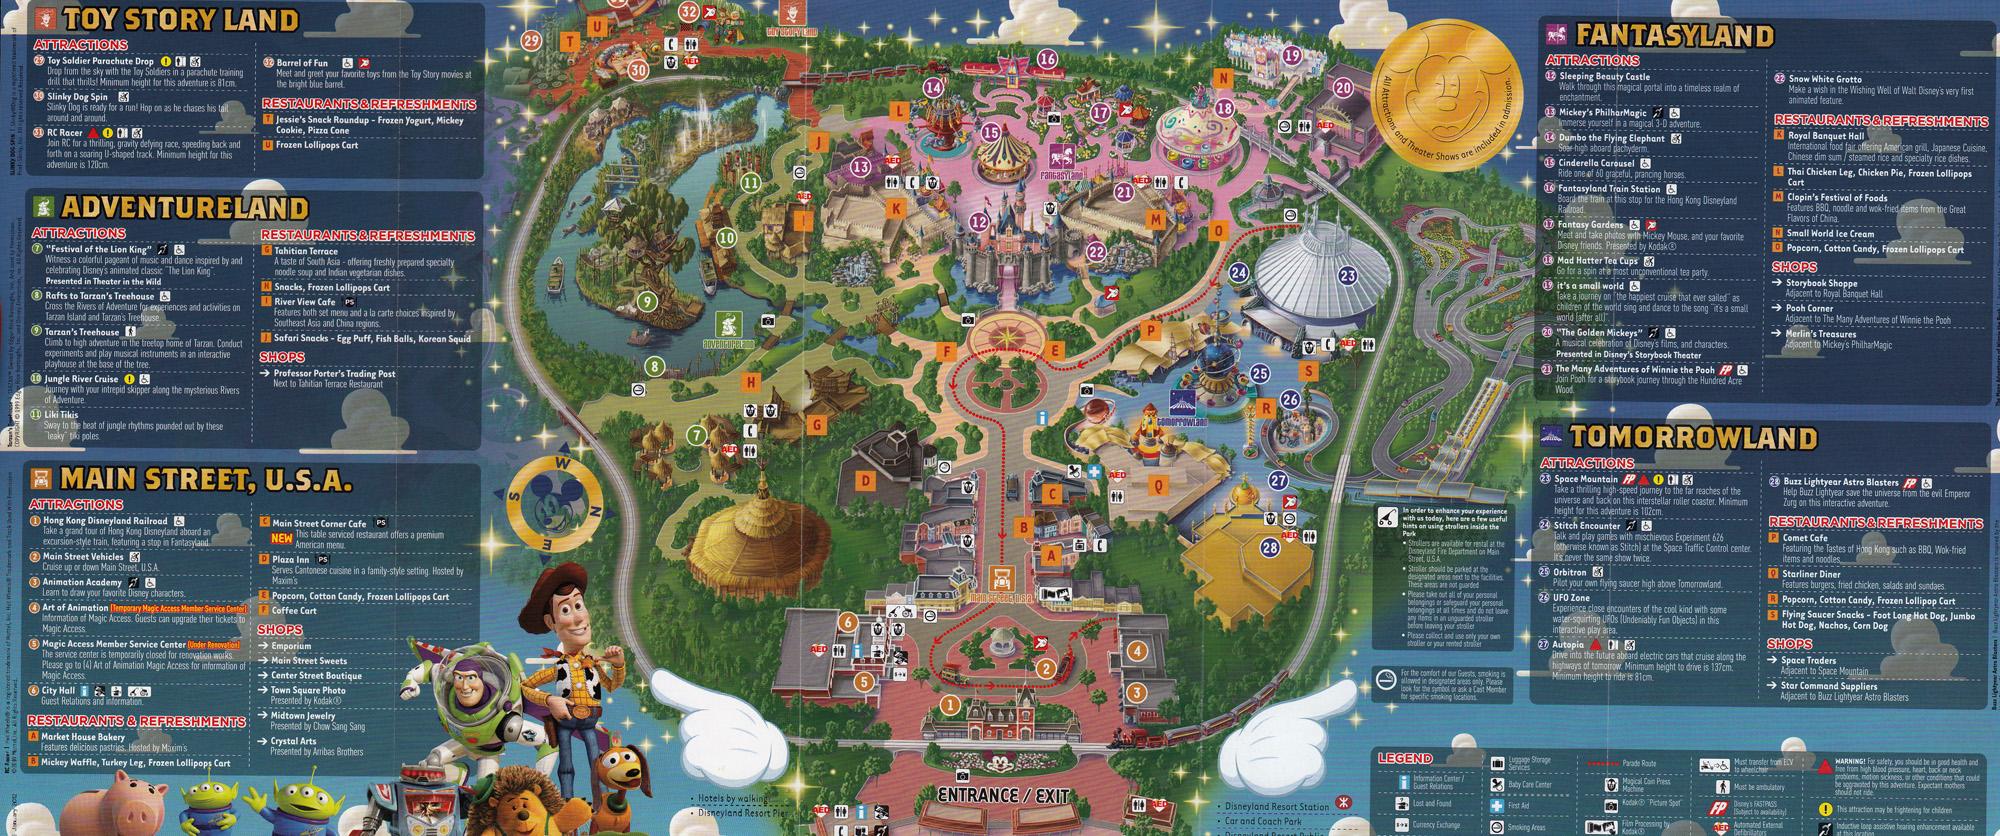 Hongkong Tour (Day 4) : Have Fun at Hongkong Disneyland